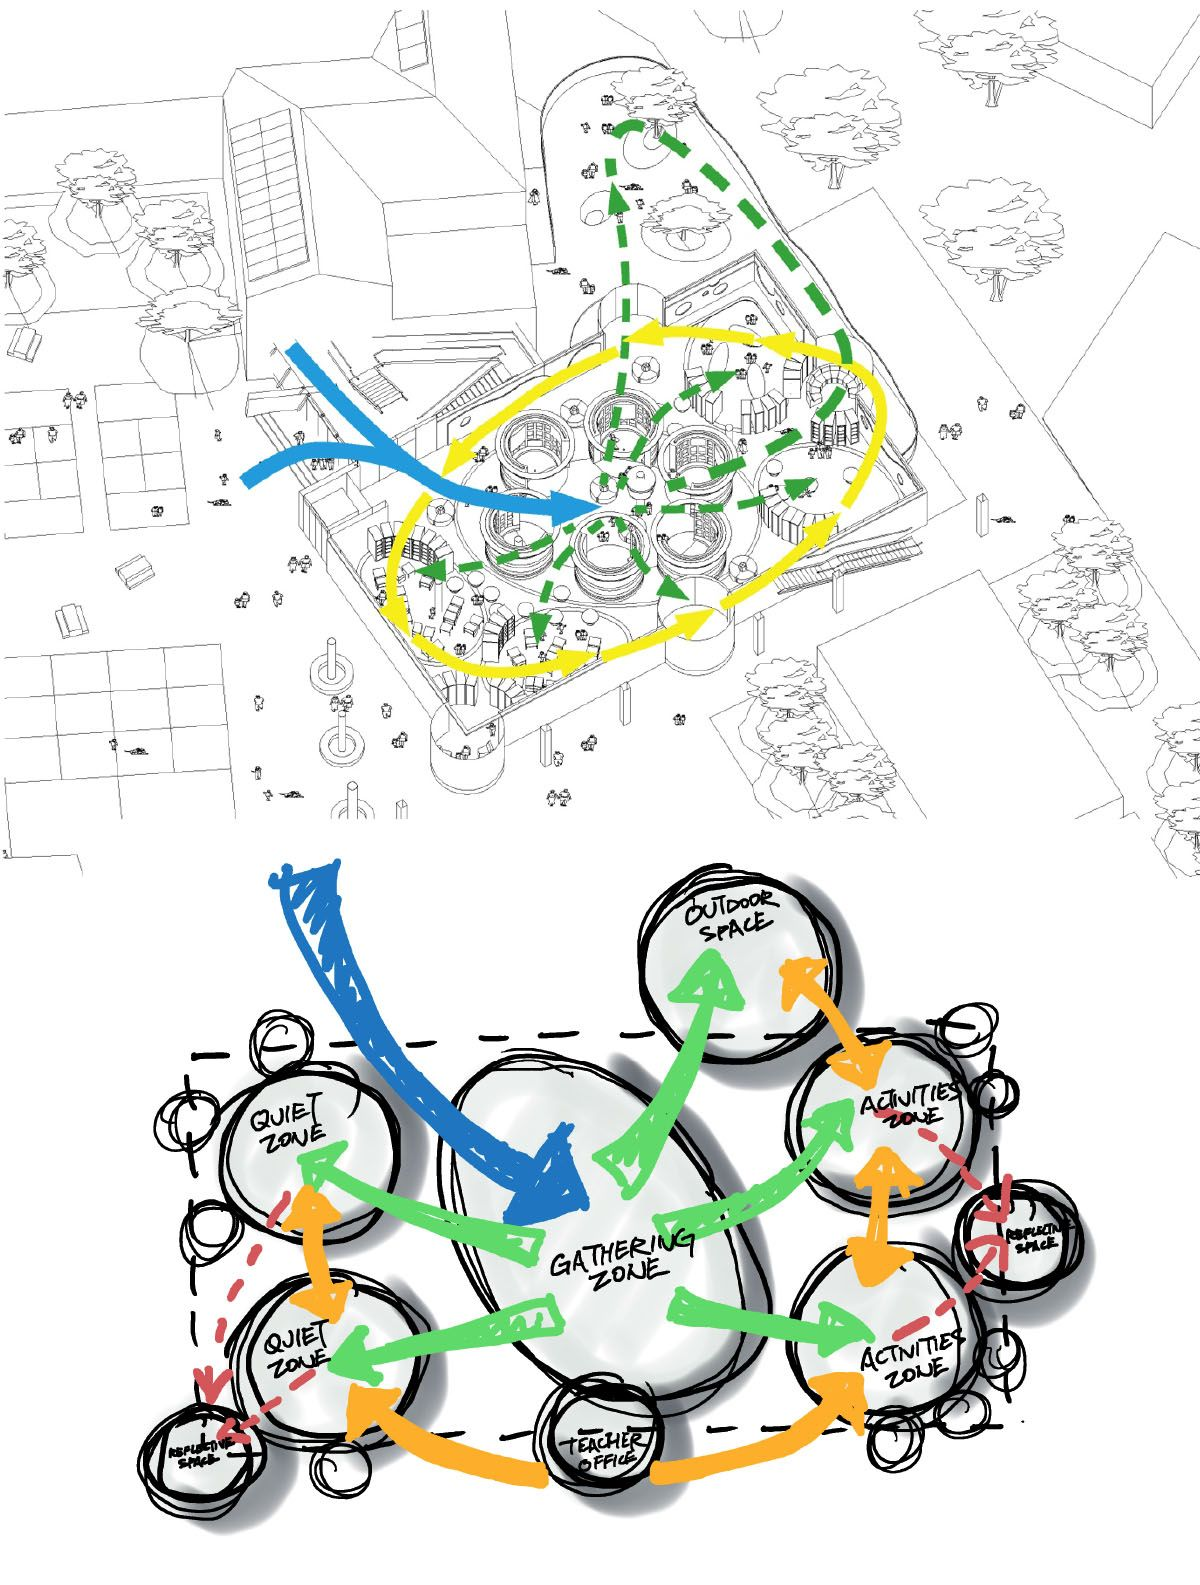 hight resolution of flemington primary school interior design circulation and movement diagrams